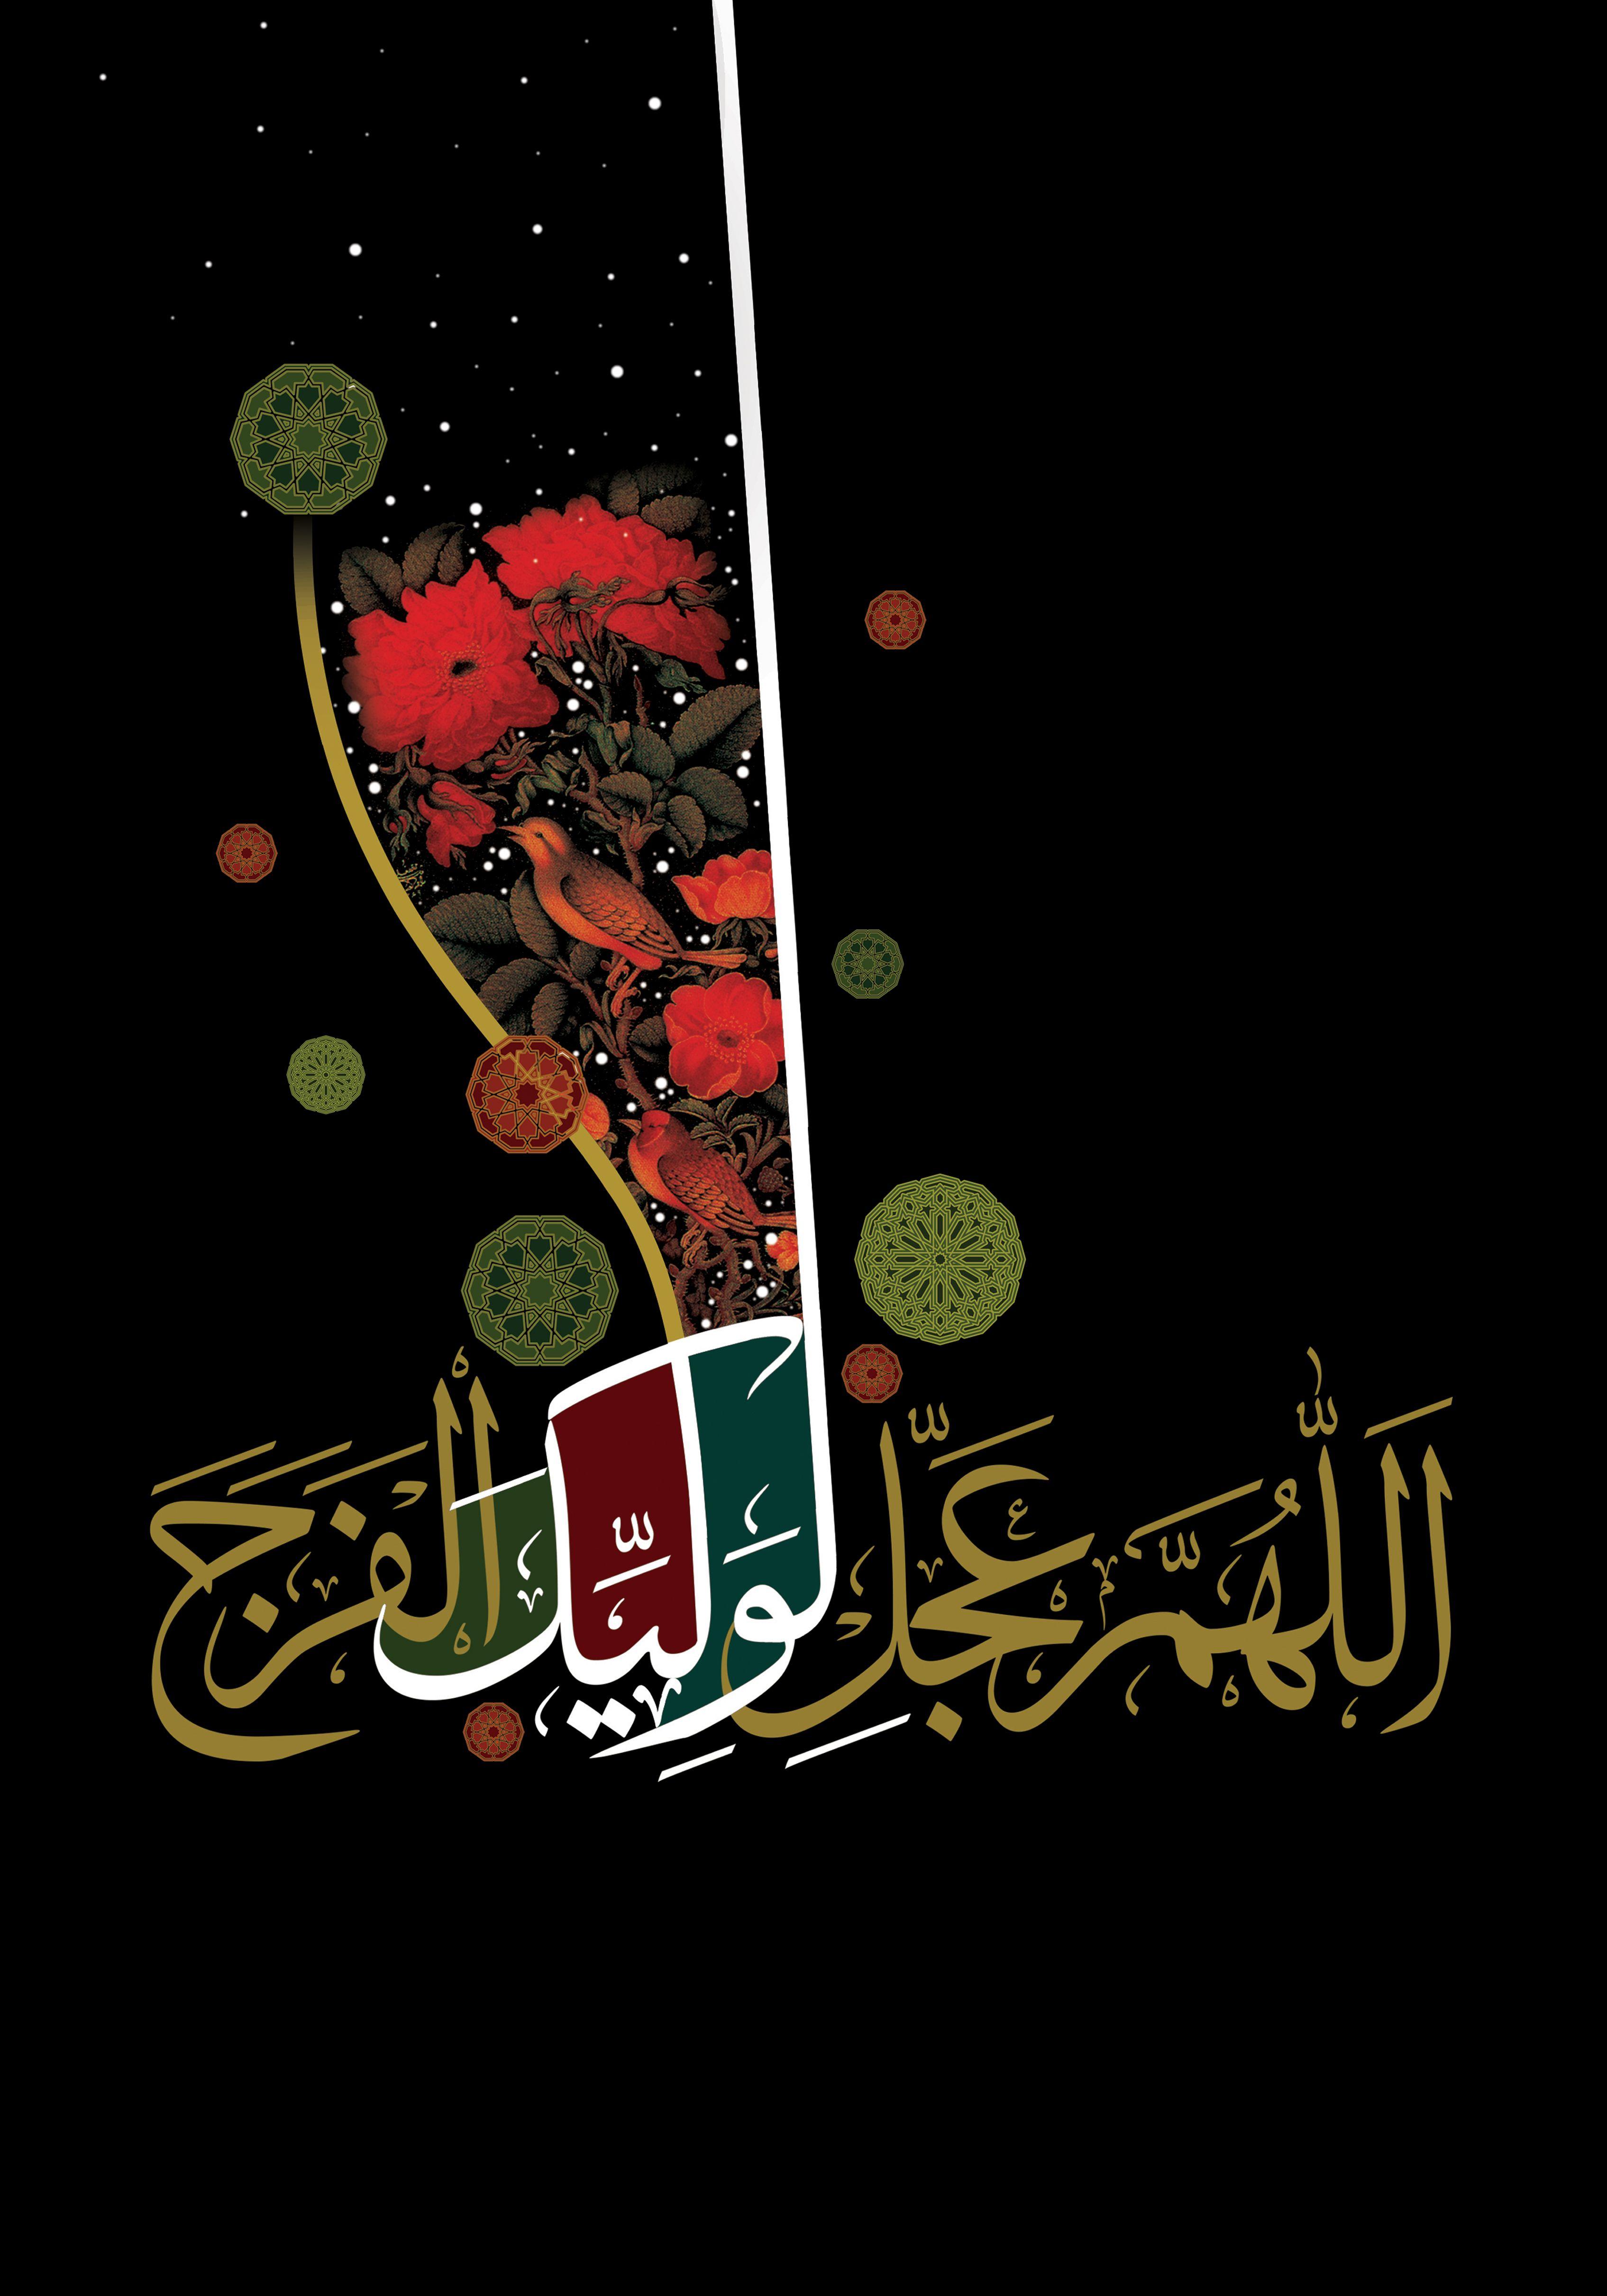 Emame Mehrabane Man 1 Islamic Art Calligraphy Islamic Art Islamic Paintings